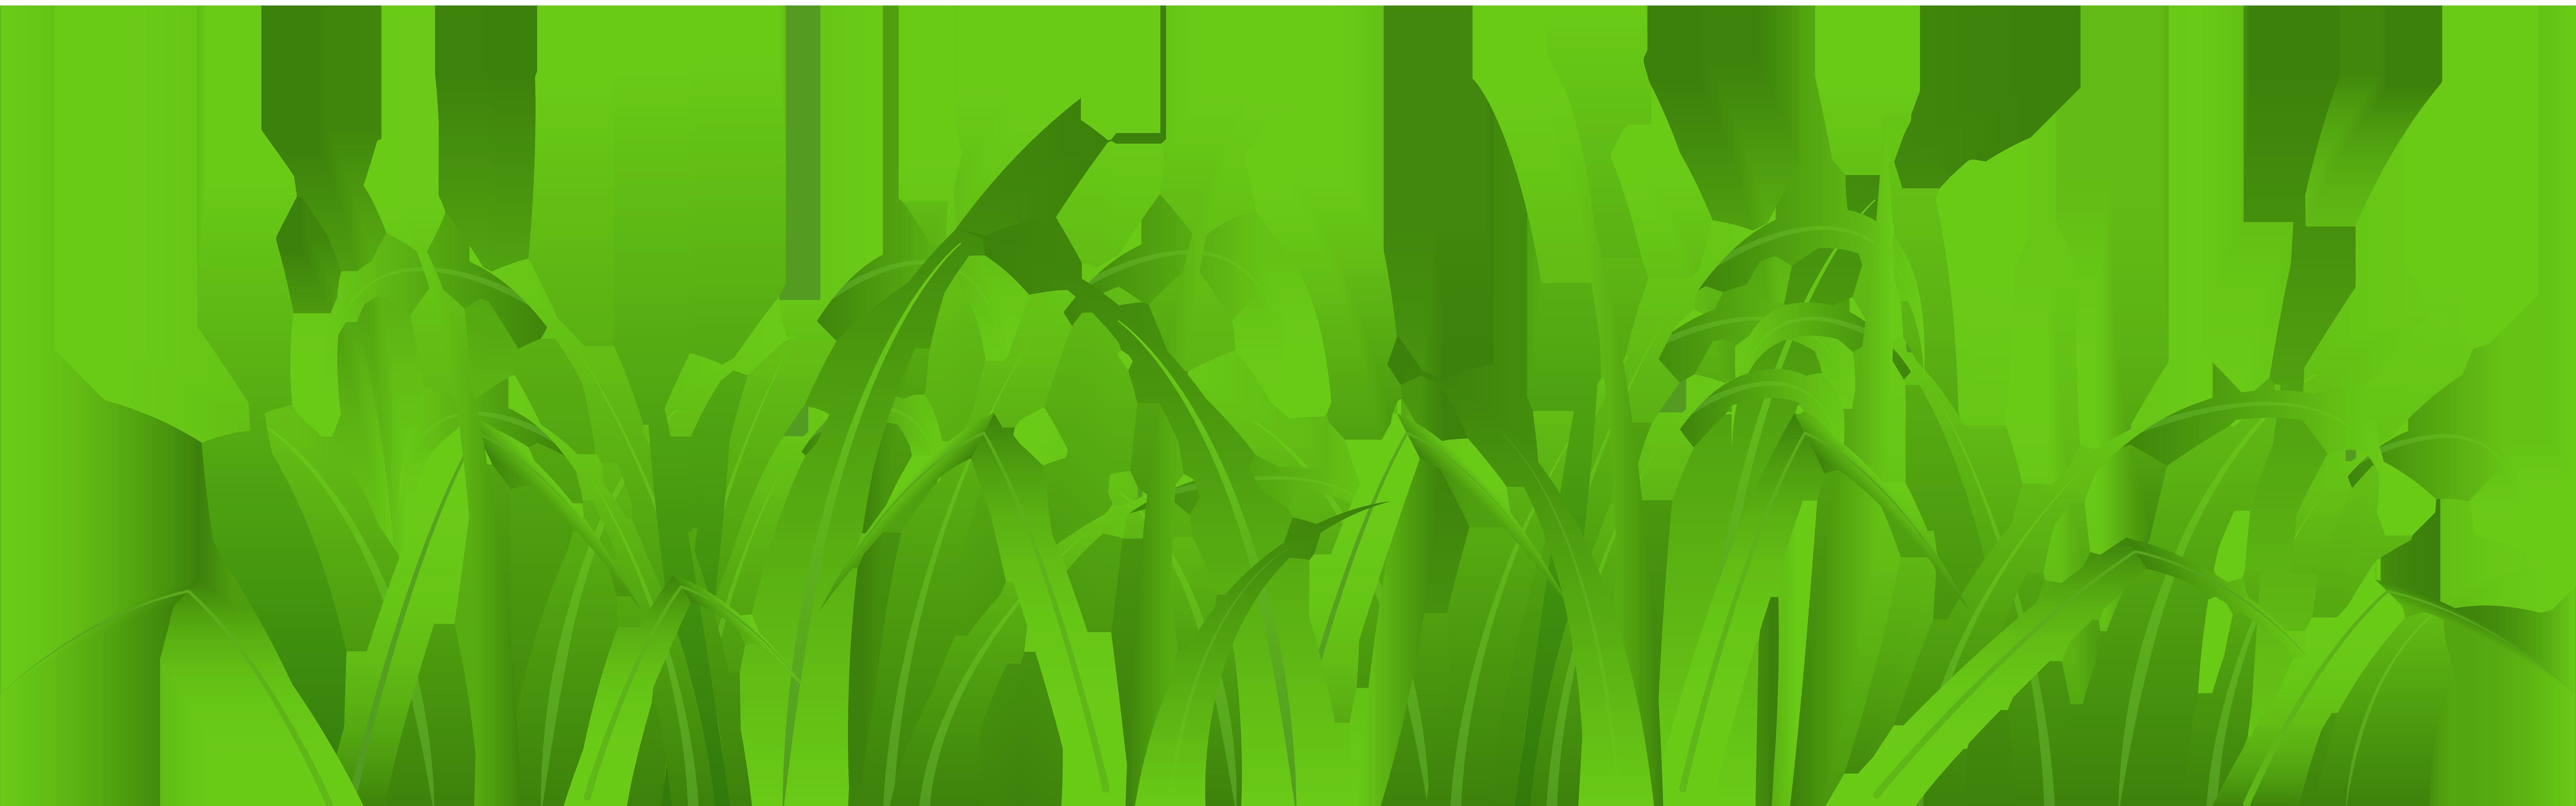 Clipart grass. Cover png clip art